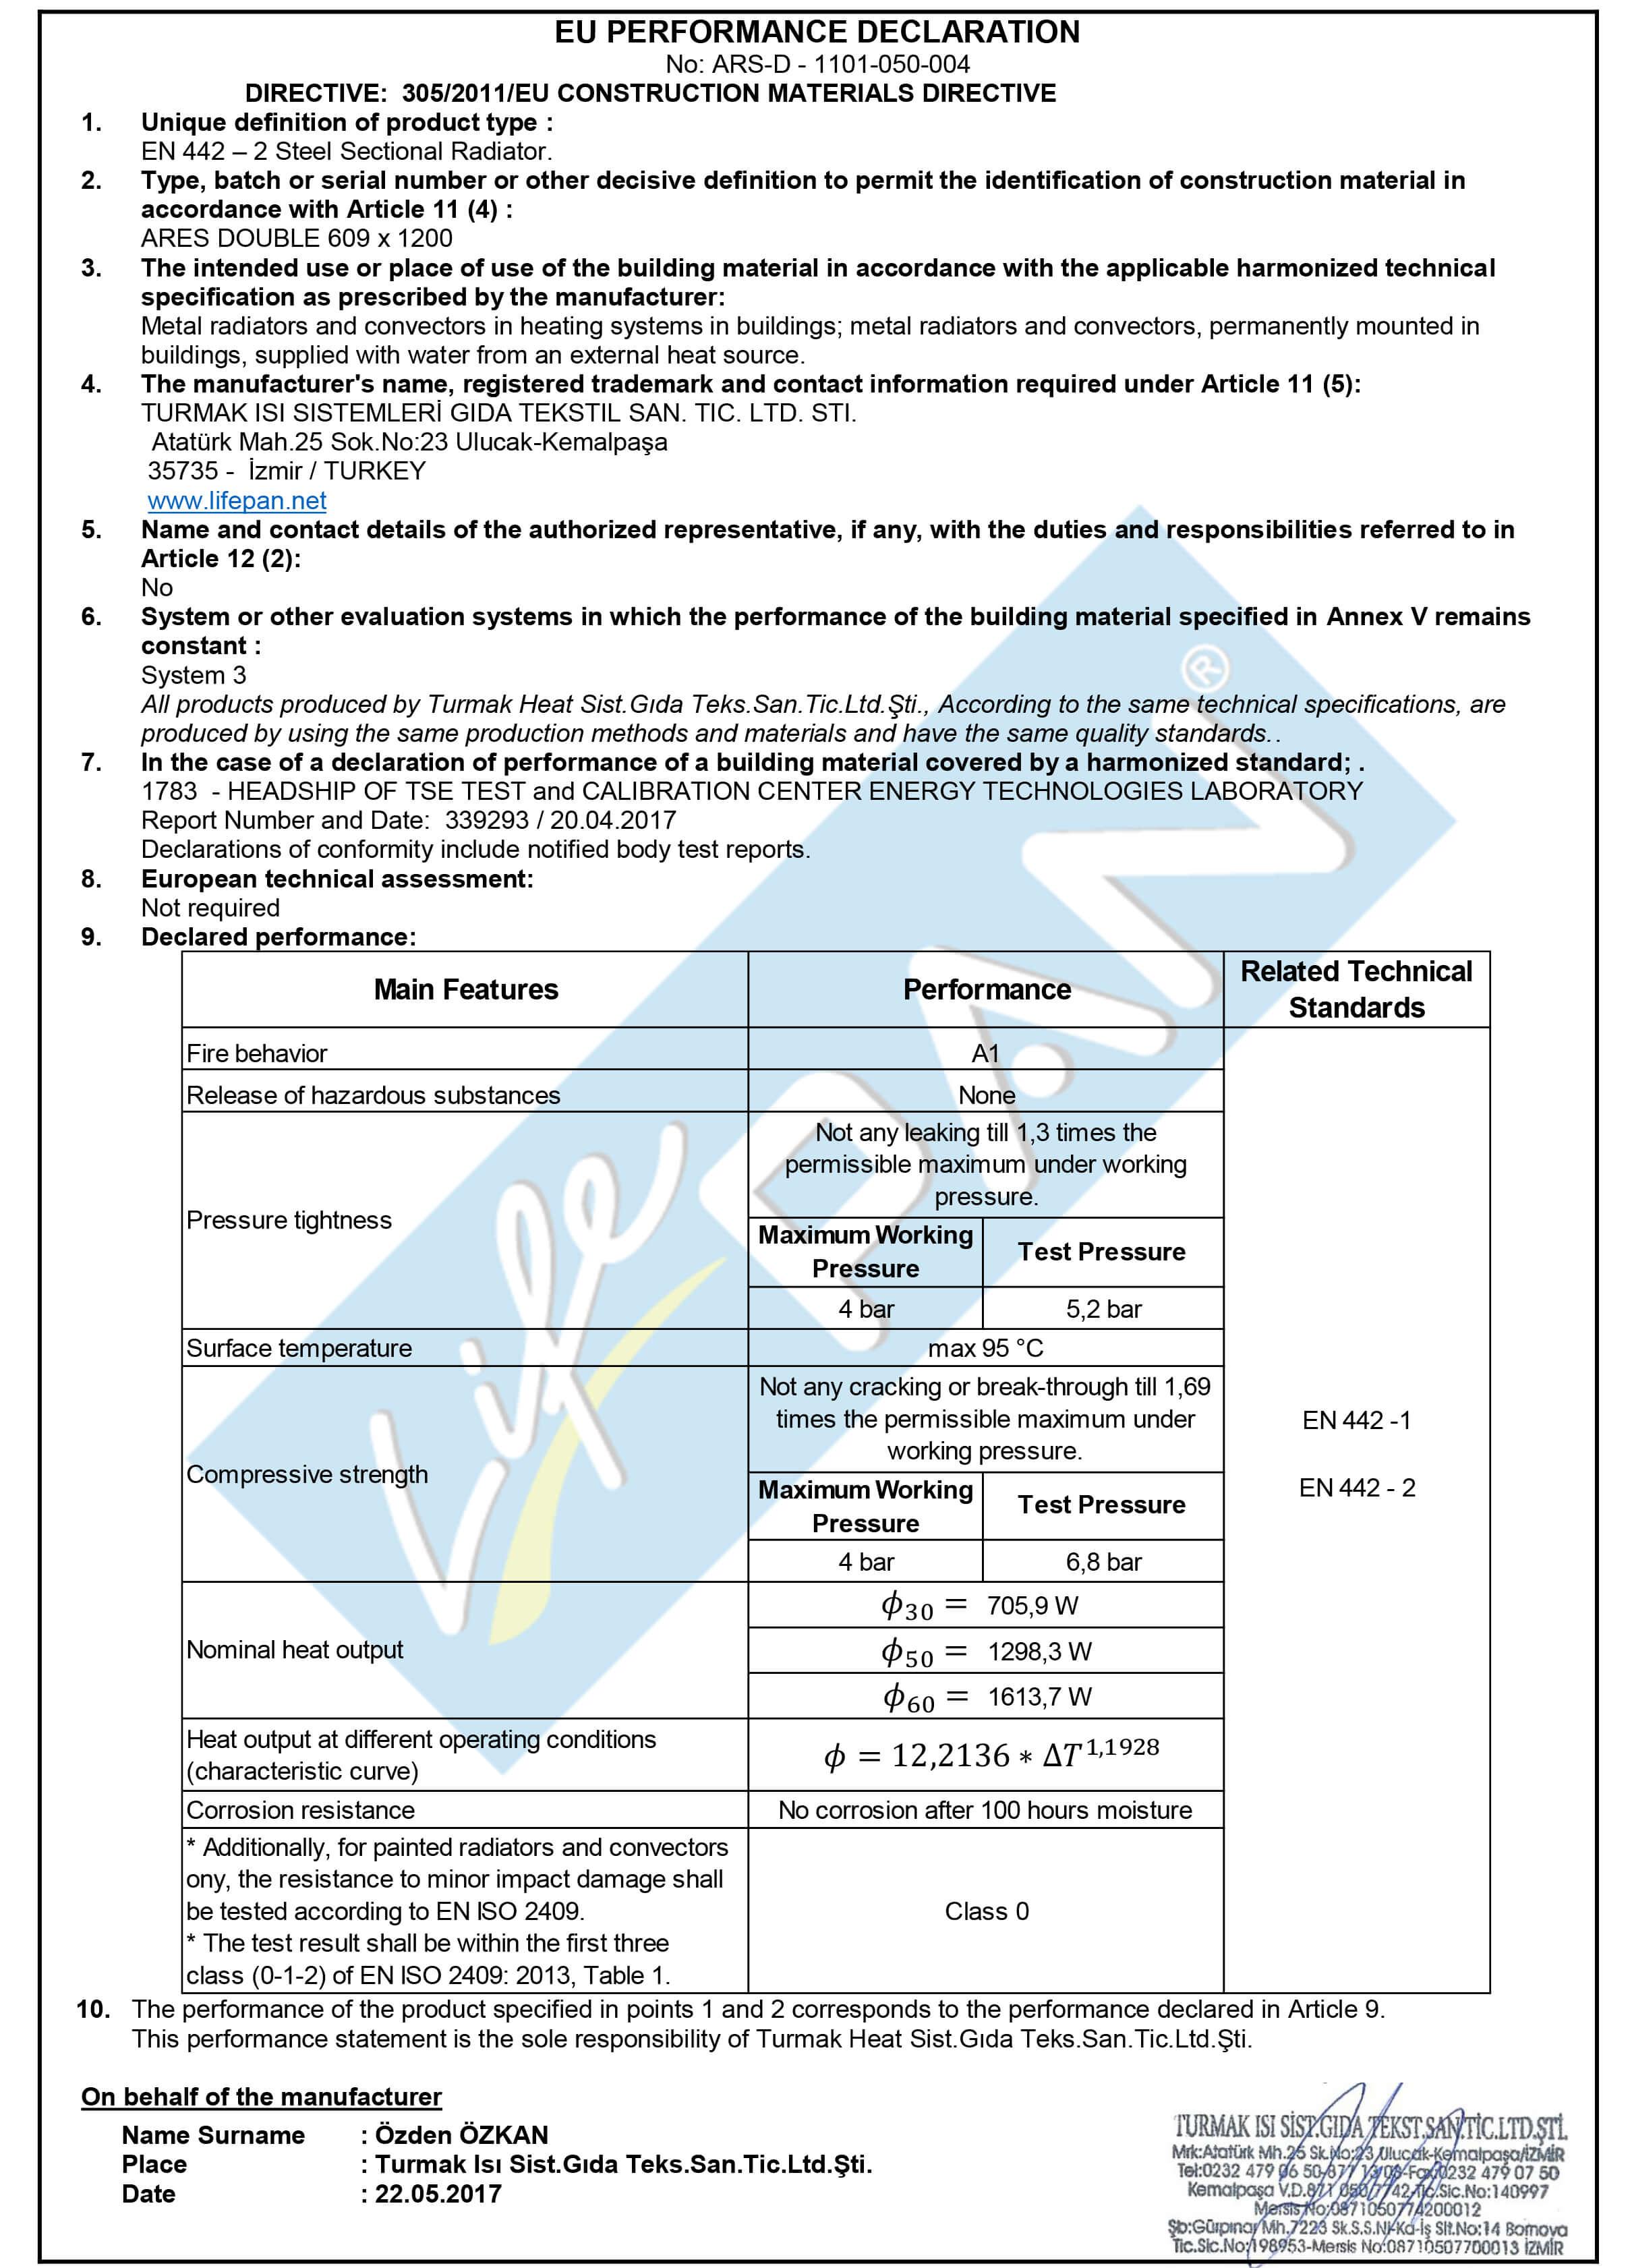 ARES VERTICAL DOUBLE 609x1200 EU PERFORMANCE DECLARATION